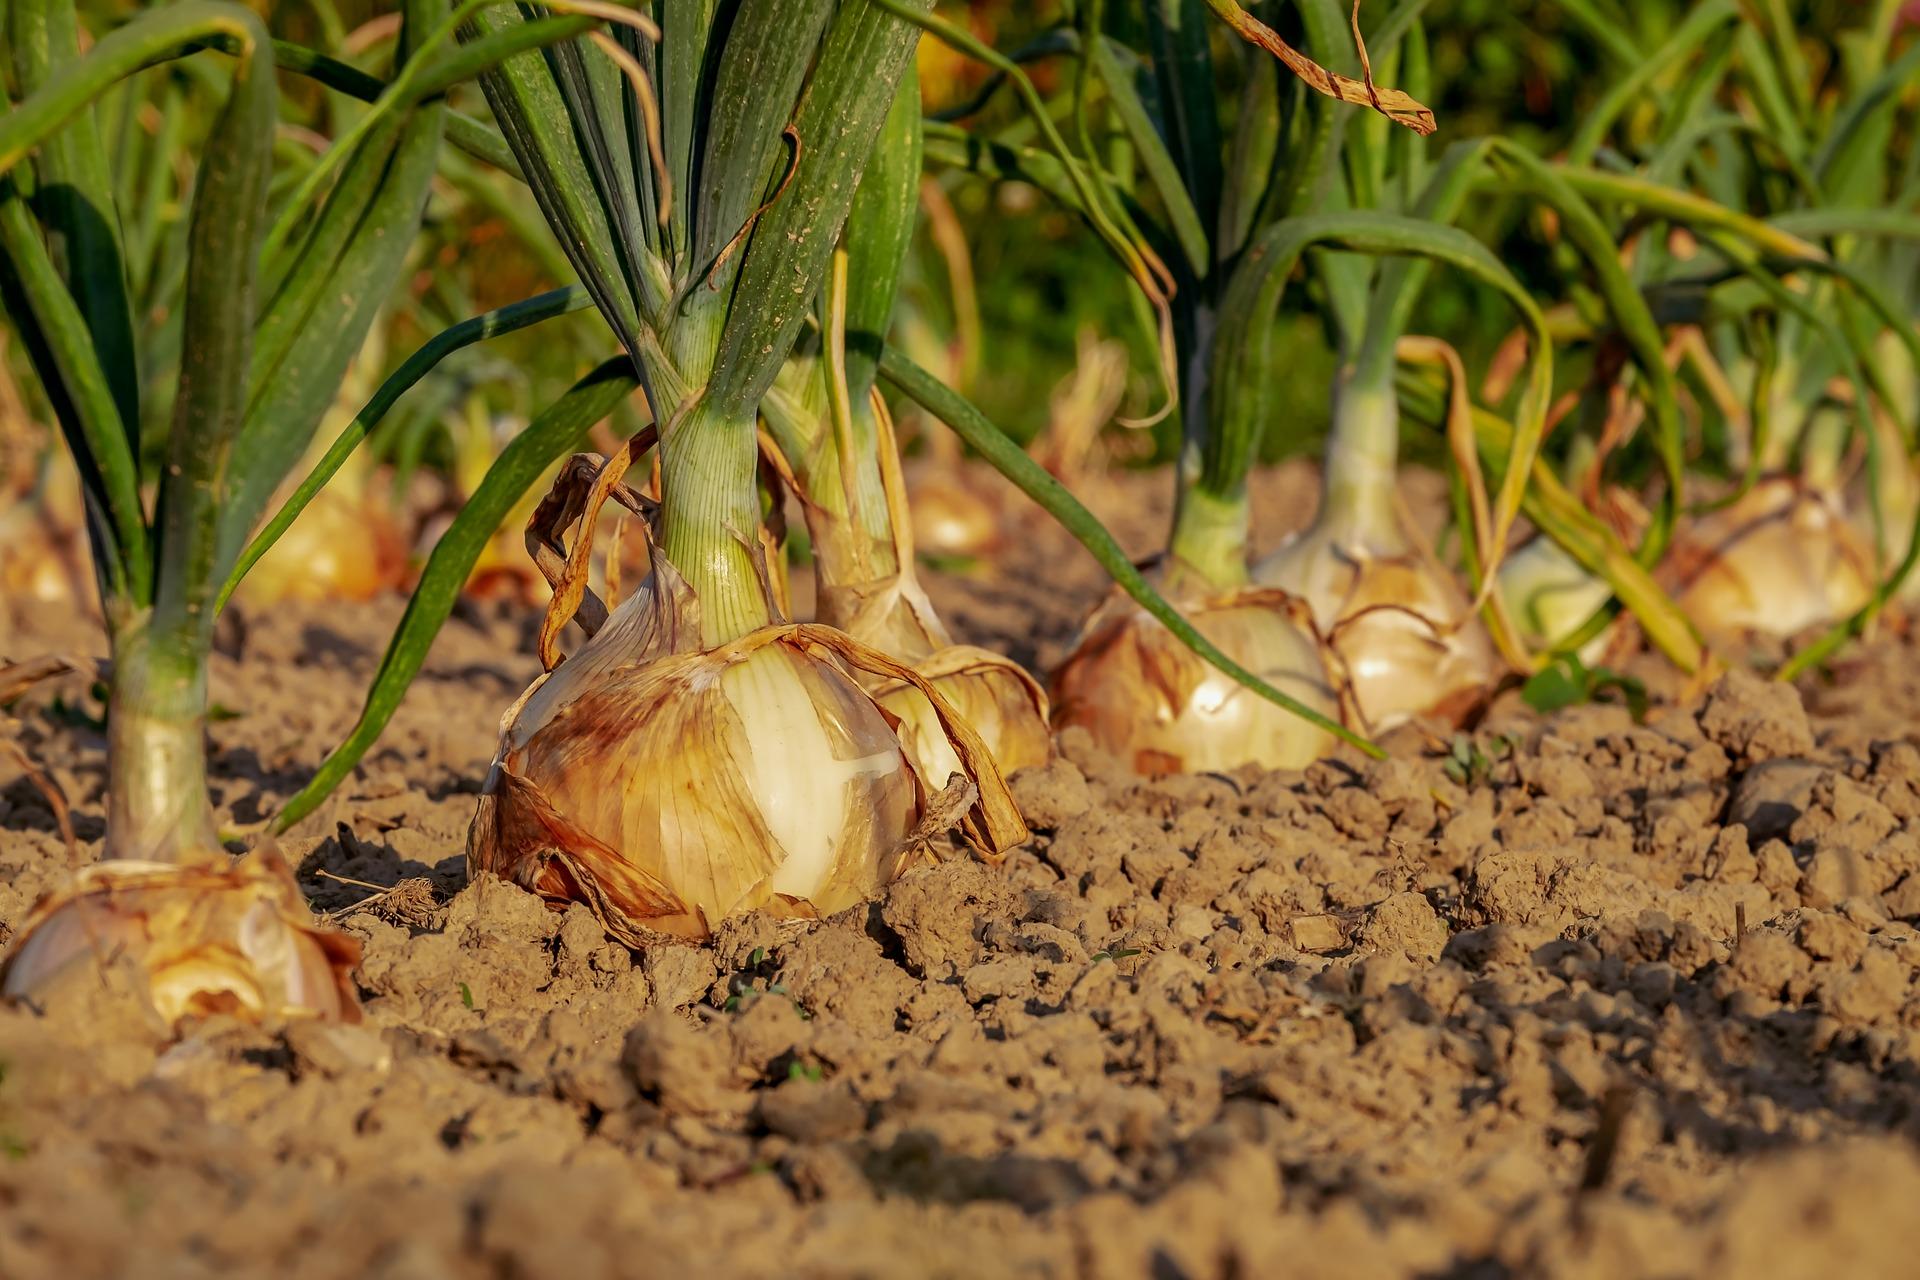 onion-3540502_1920.jpg